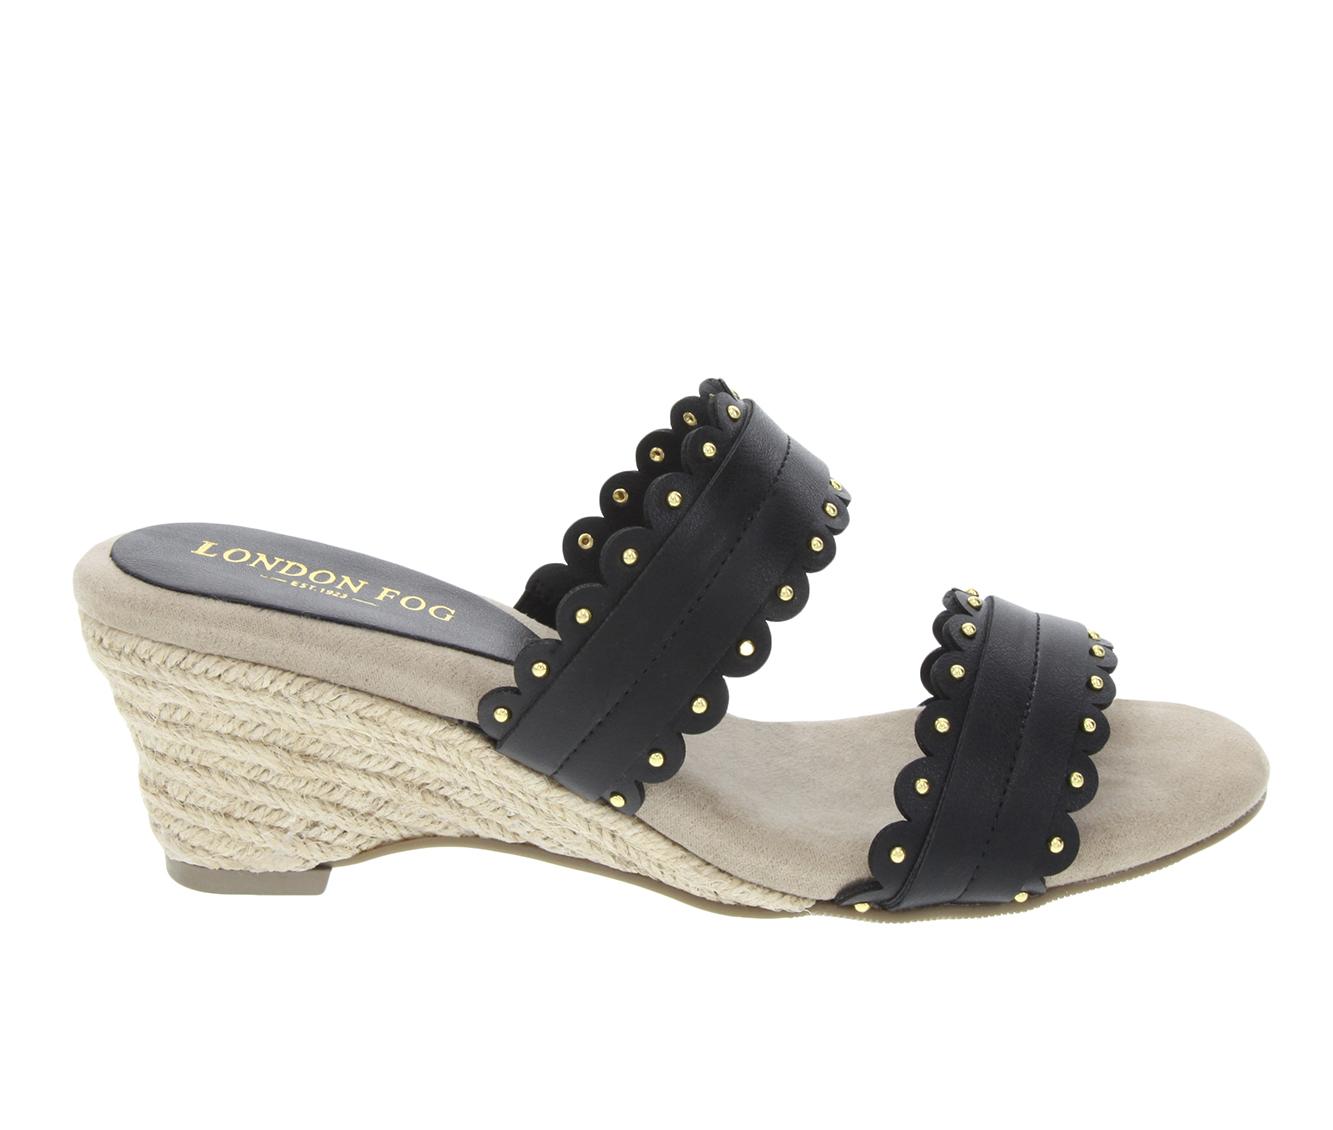 London Fog Kay Women's Sandal (Black Faux Leather)